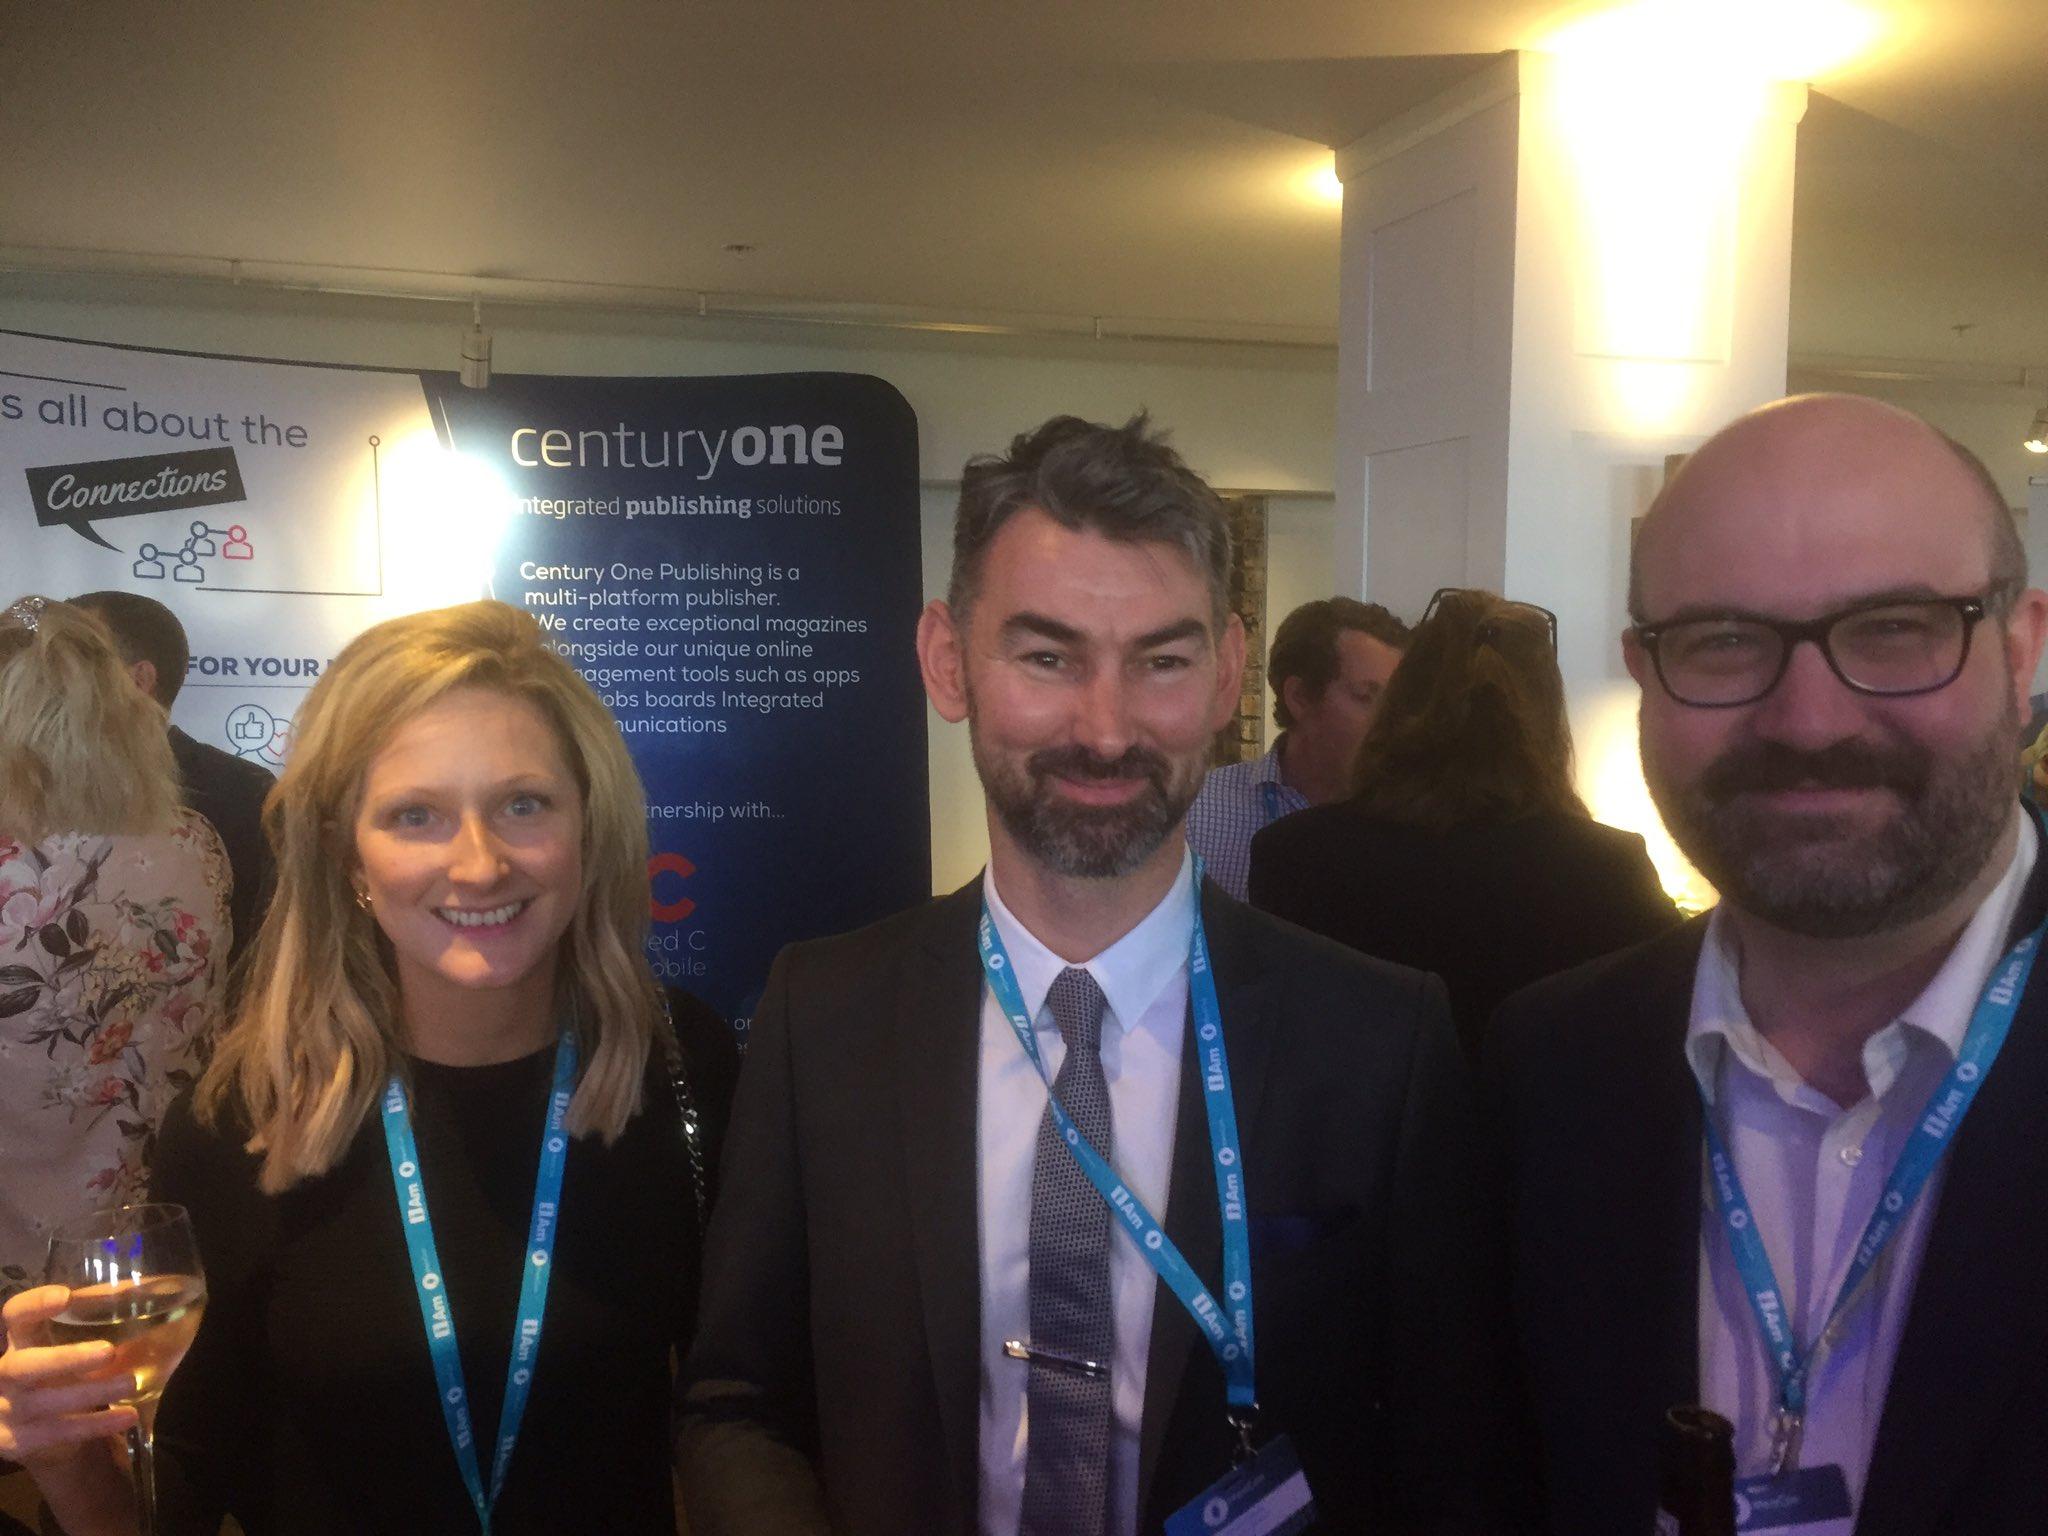 Team @CIPR_UK @ThinkPublishing #Influence magazine #MemCom17 https://t.co/jkEHdv3U8J